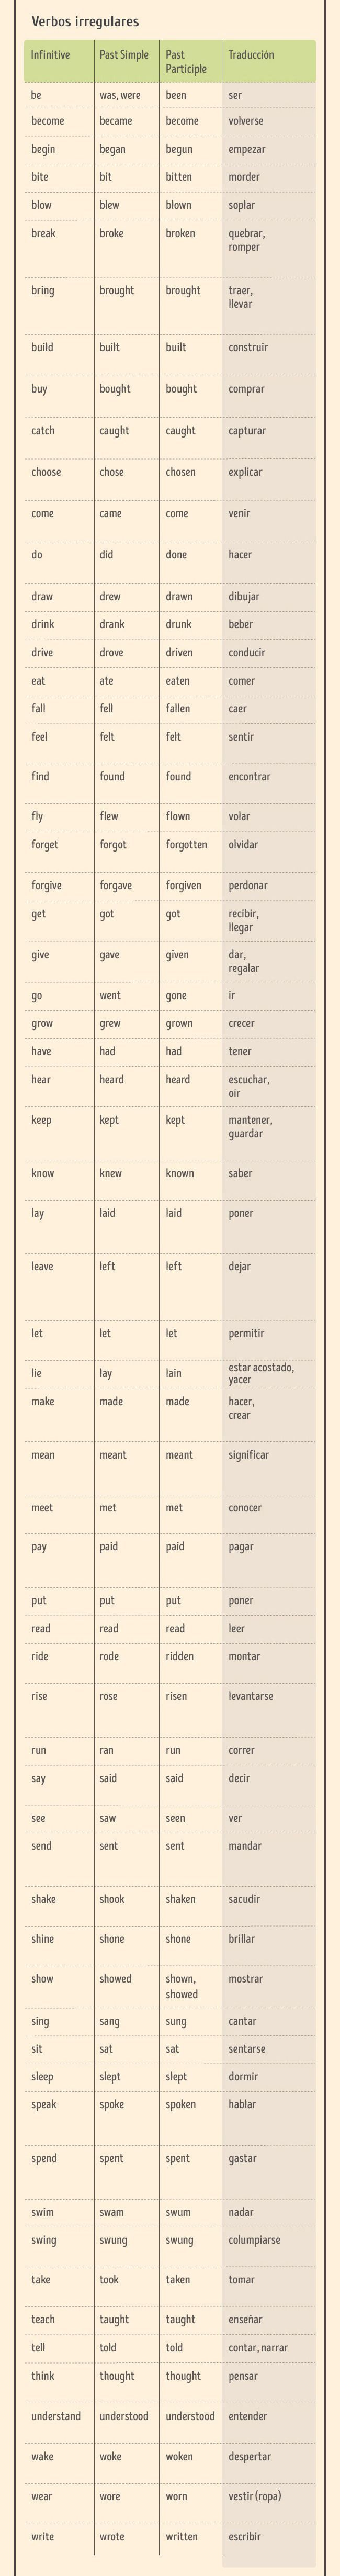 Https://k34.kn3.net/taringa/9/E/1/D/4/2/ytuquemevees/137.gif. Https://k33.kn3.net/D/B/A/A/4/3/2A0.gif. Todo acerca del inglés. Https://k33.kn3.net/D/B/A/A/4/3/2A0.gif. El inglés es el idioma más popular del mundo. De acuerdo a las estadísticas, lo...